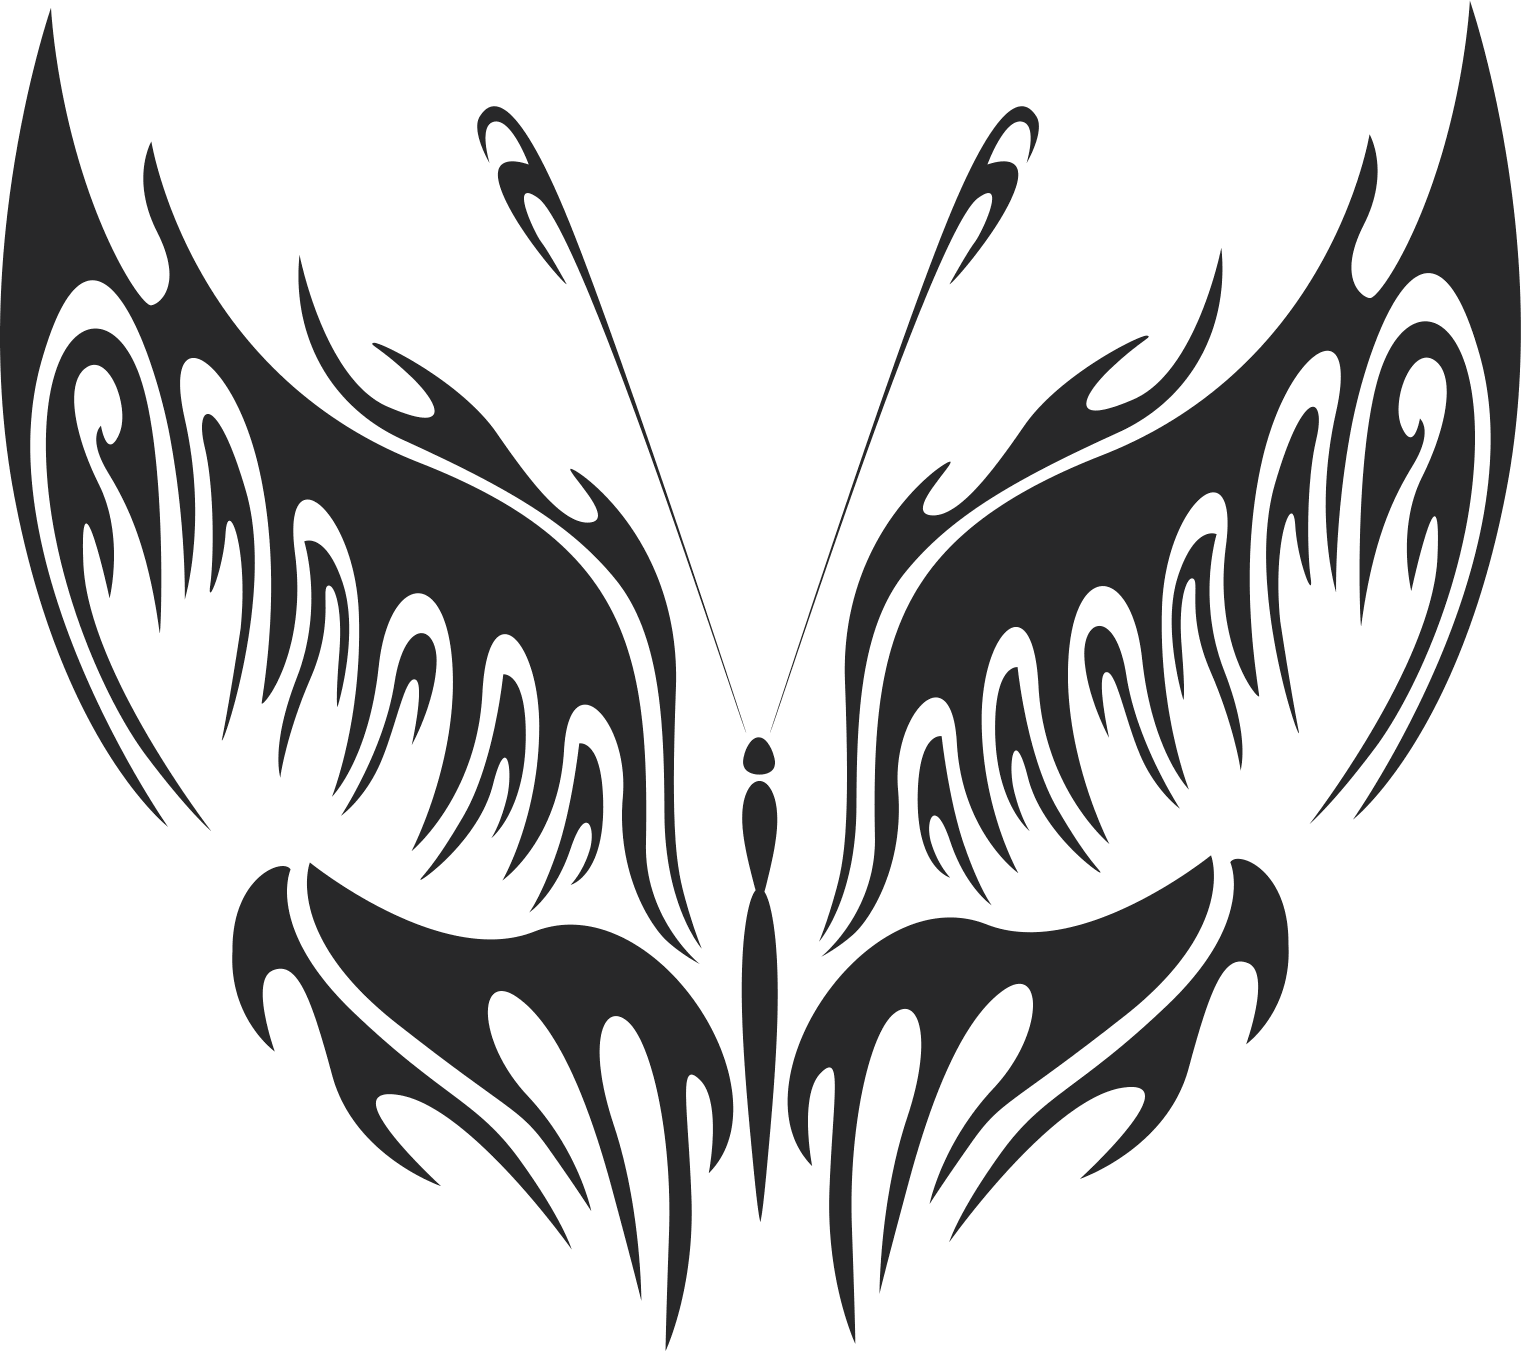 Butterfly Silhouette Art Free CDR Vectors Art